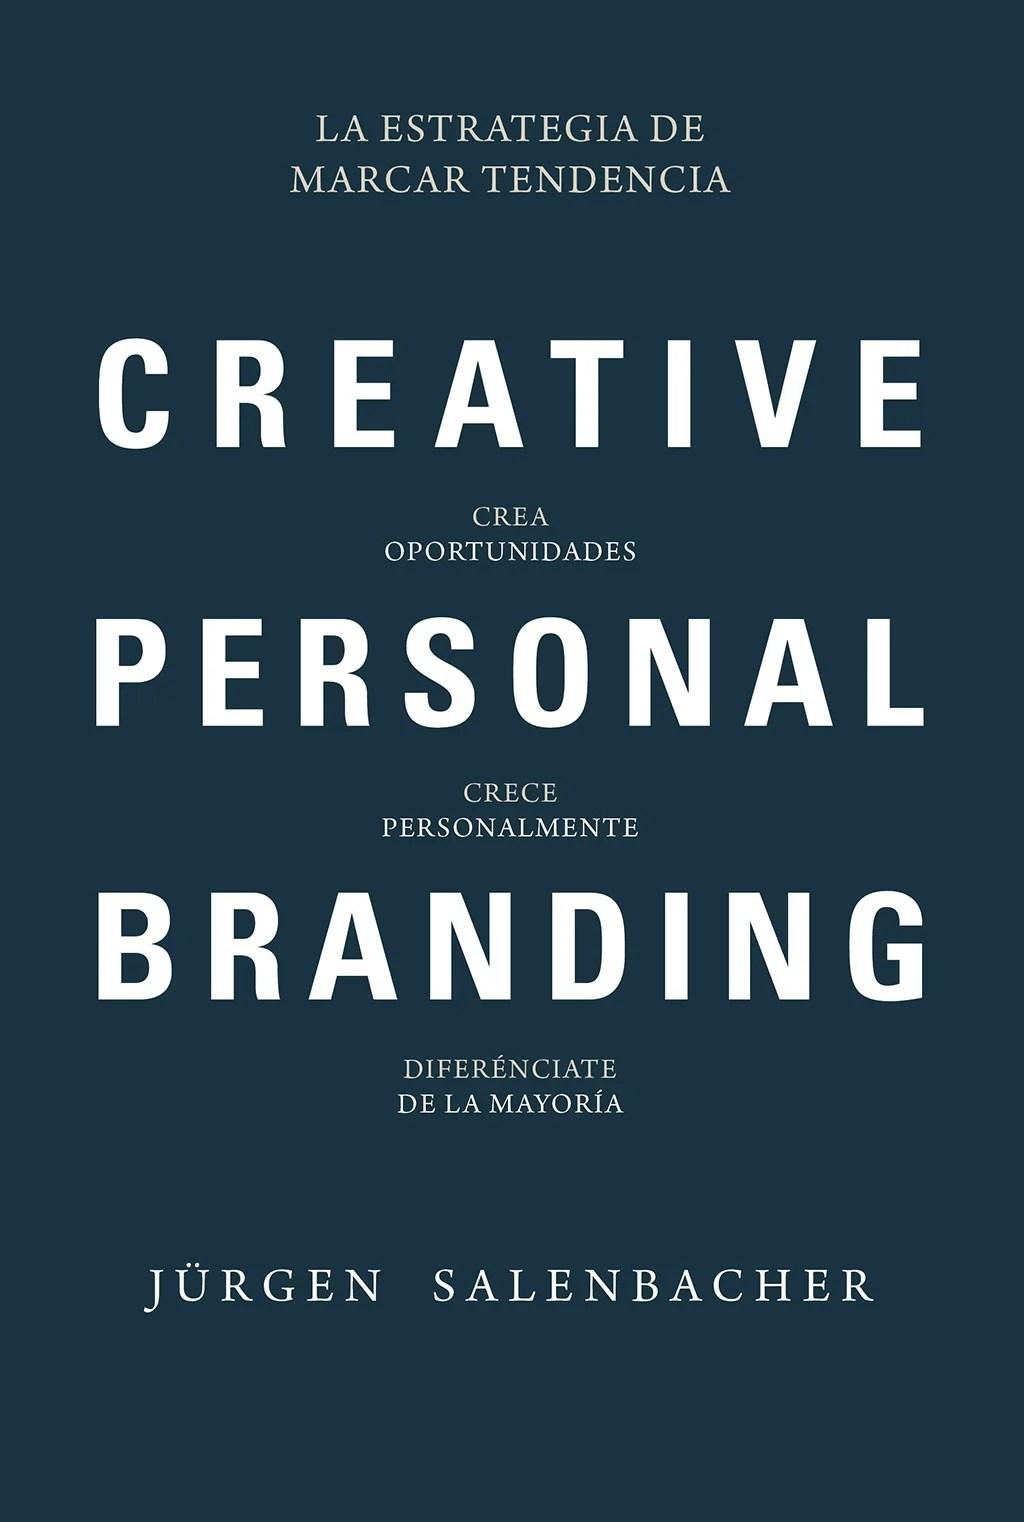 Libros de management. Creative personal branding.